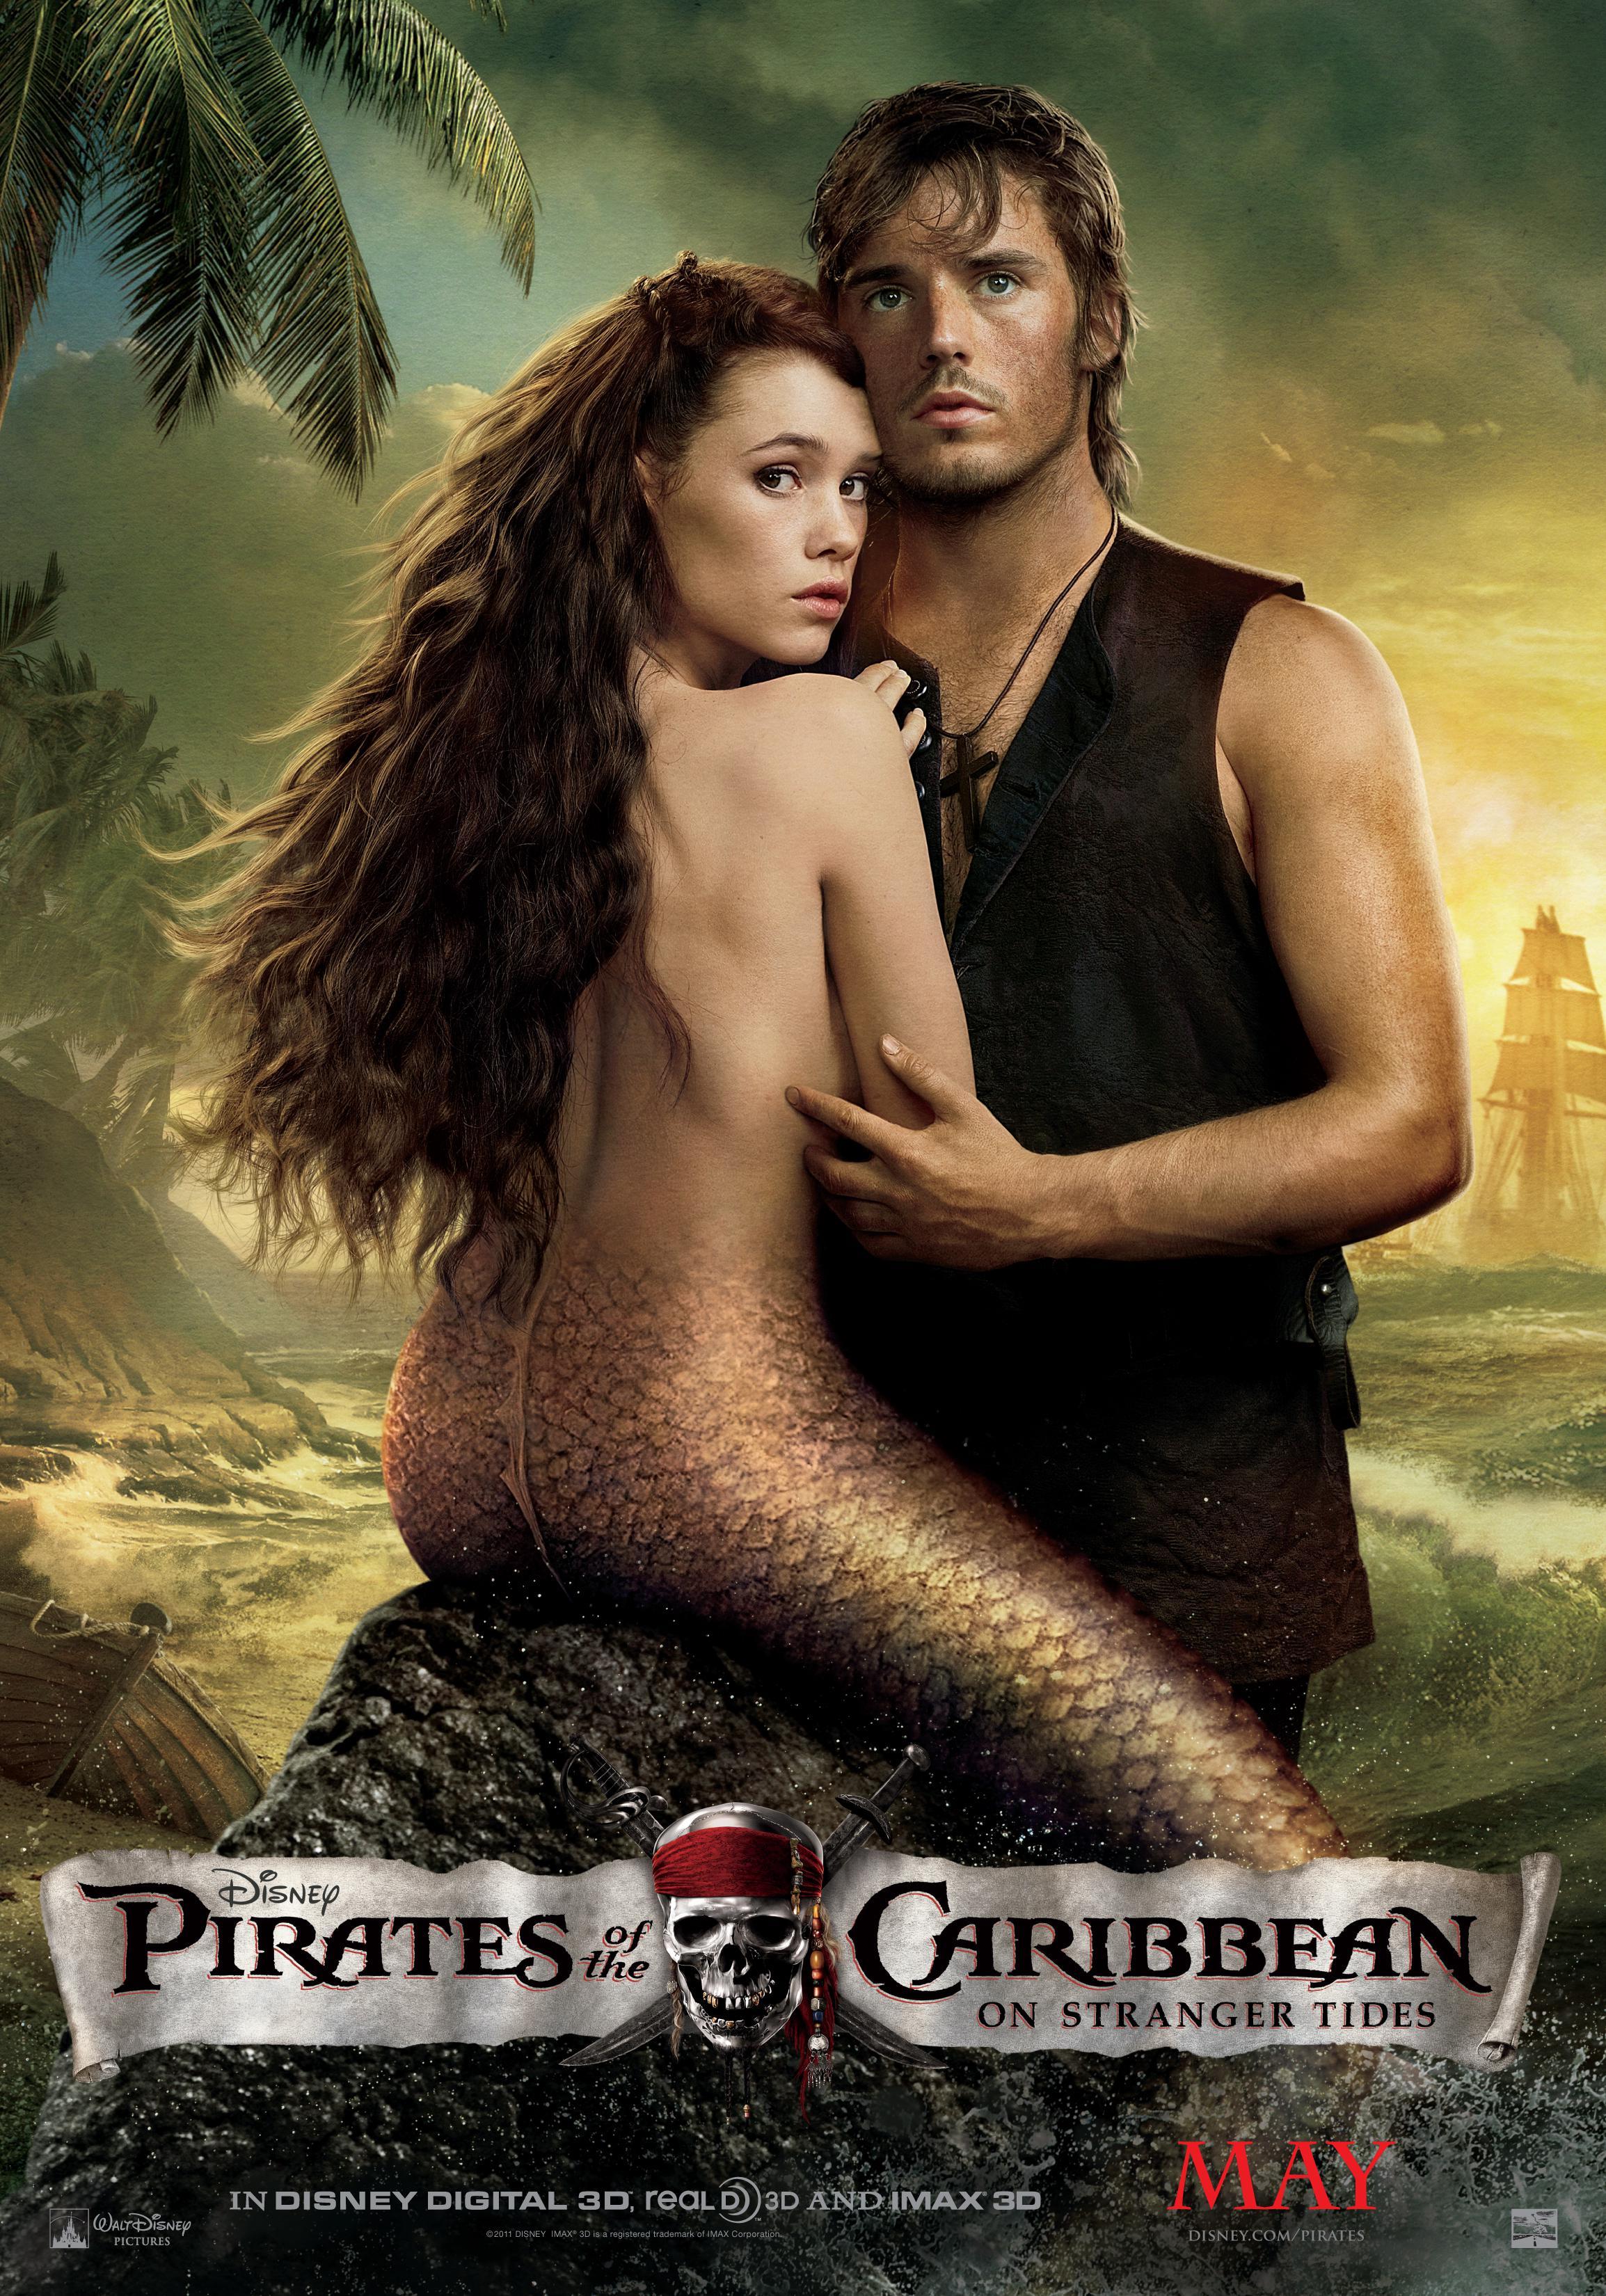 Pirates of the carabian xxx nude photos pron scene